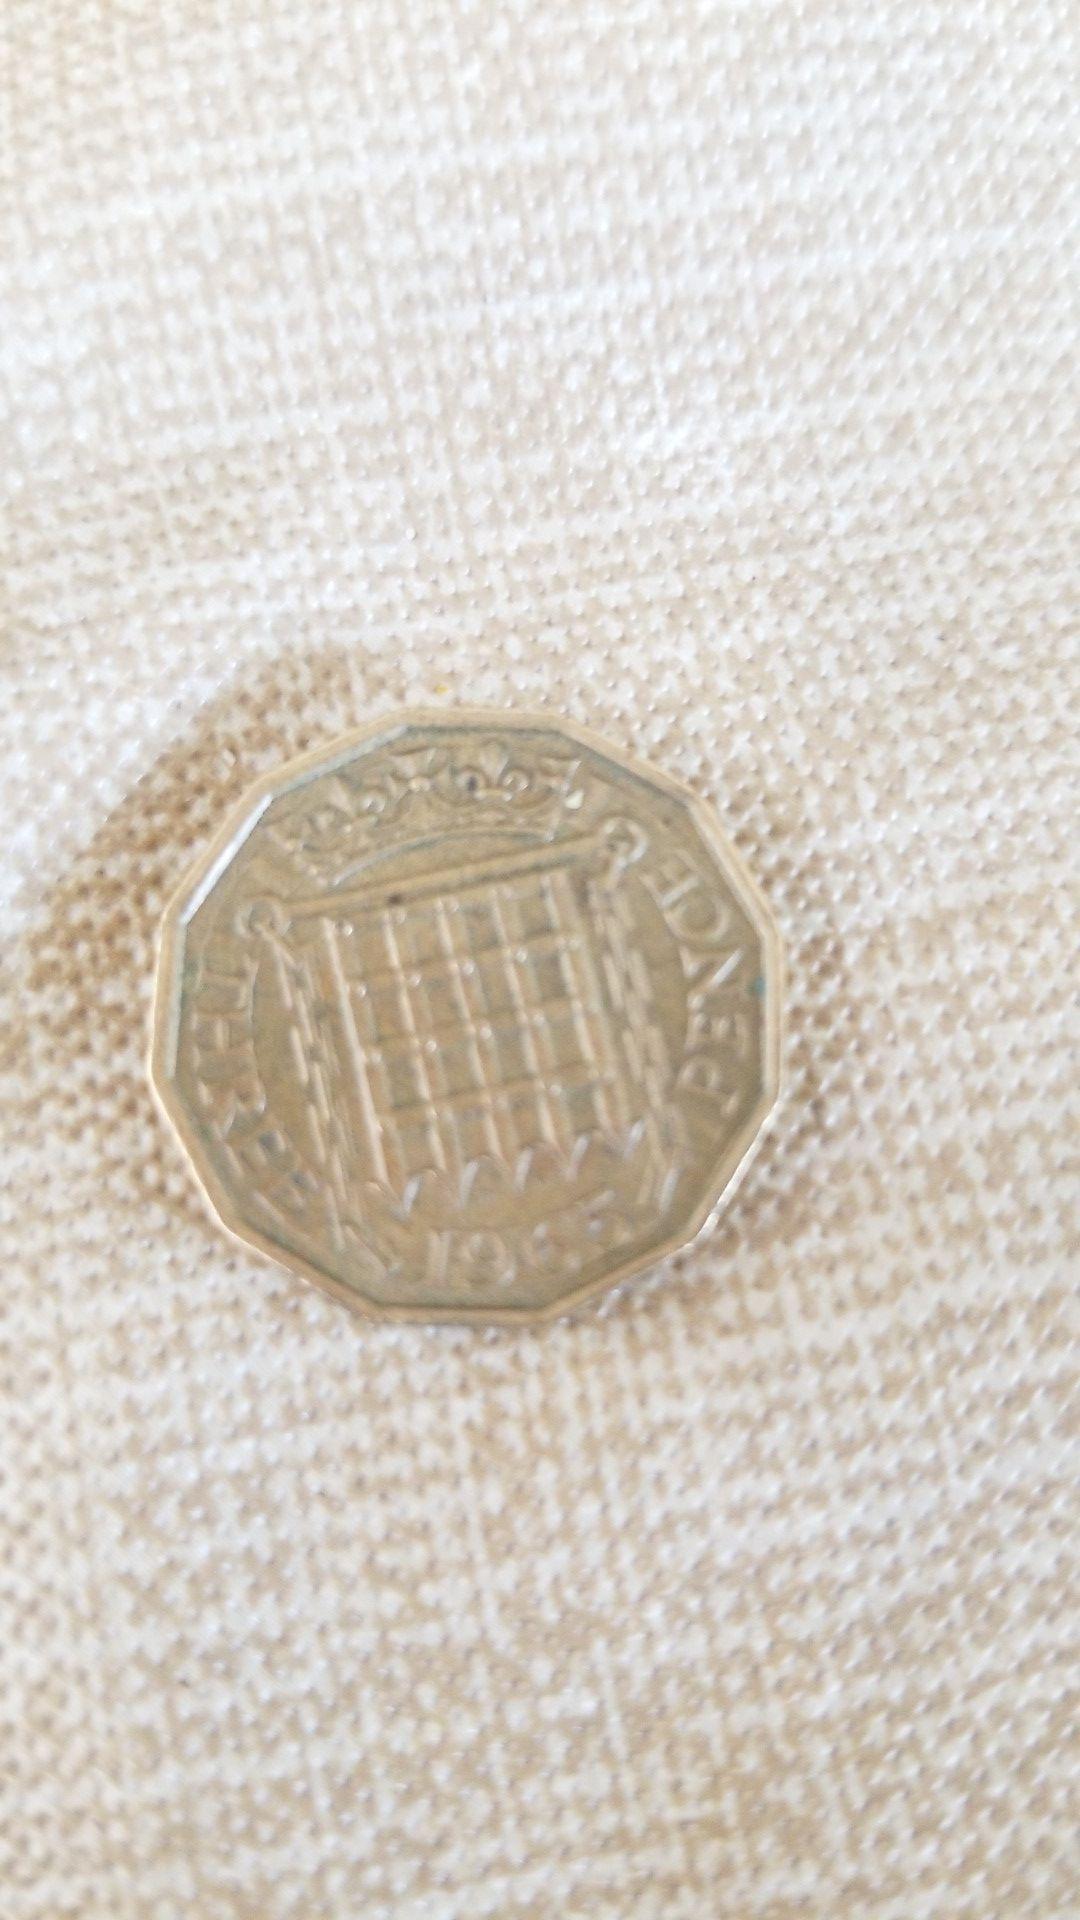 1965 3 Pence coin...make offer